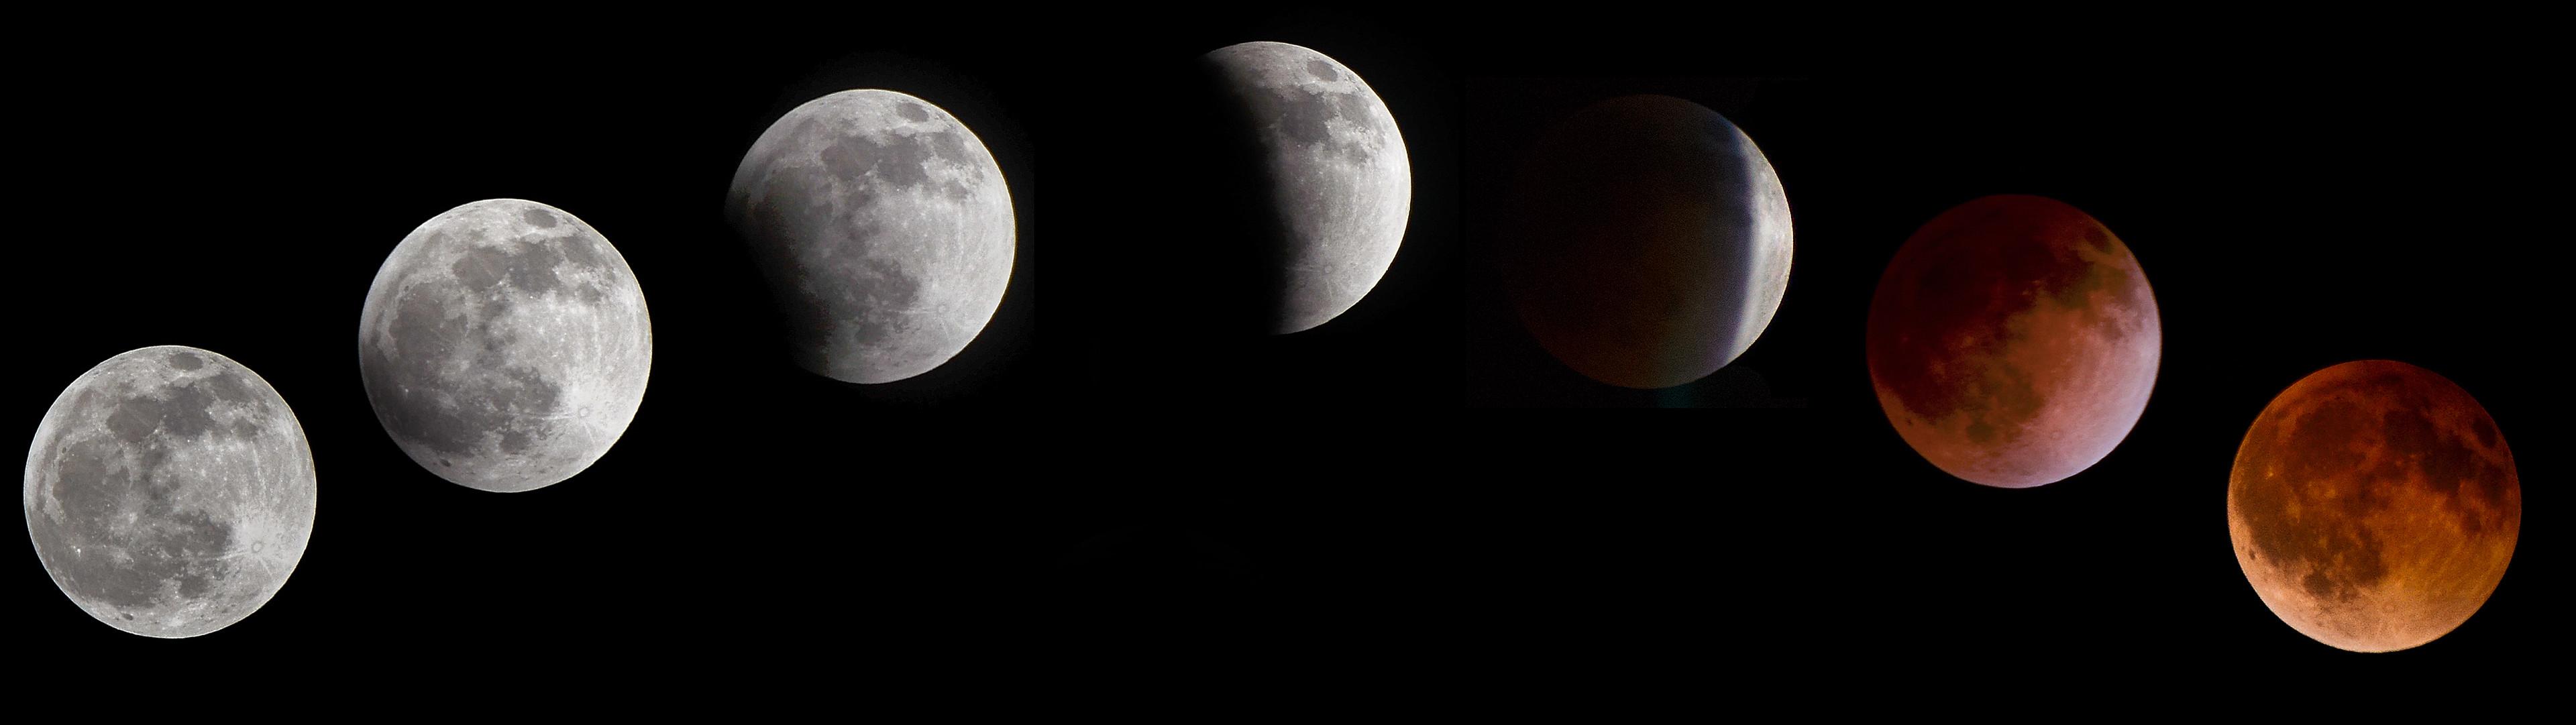 blood moon dual monitor wallpaper (3840×1080)